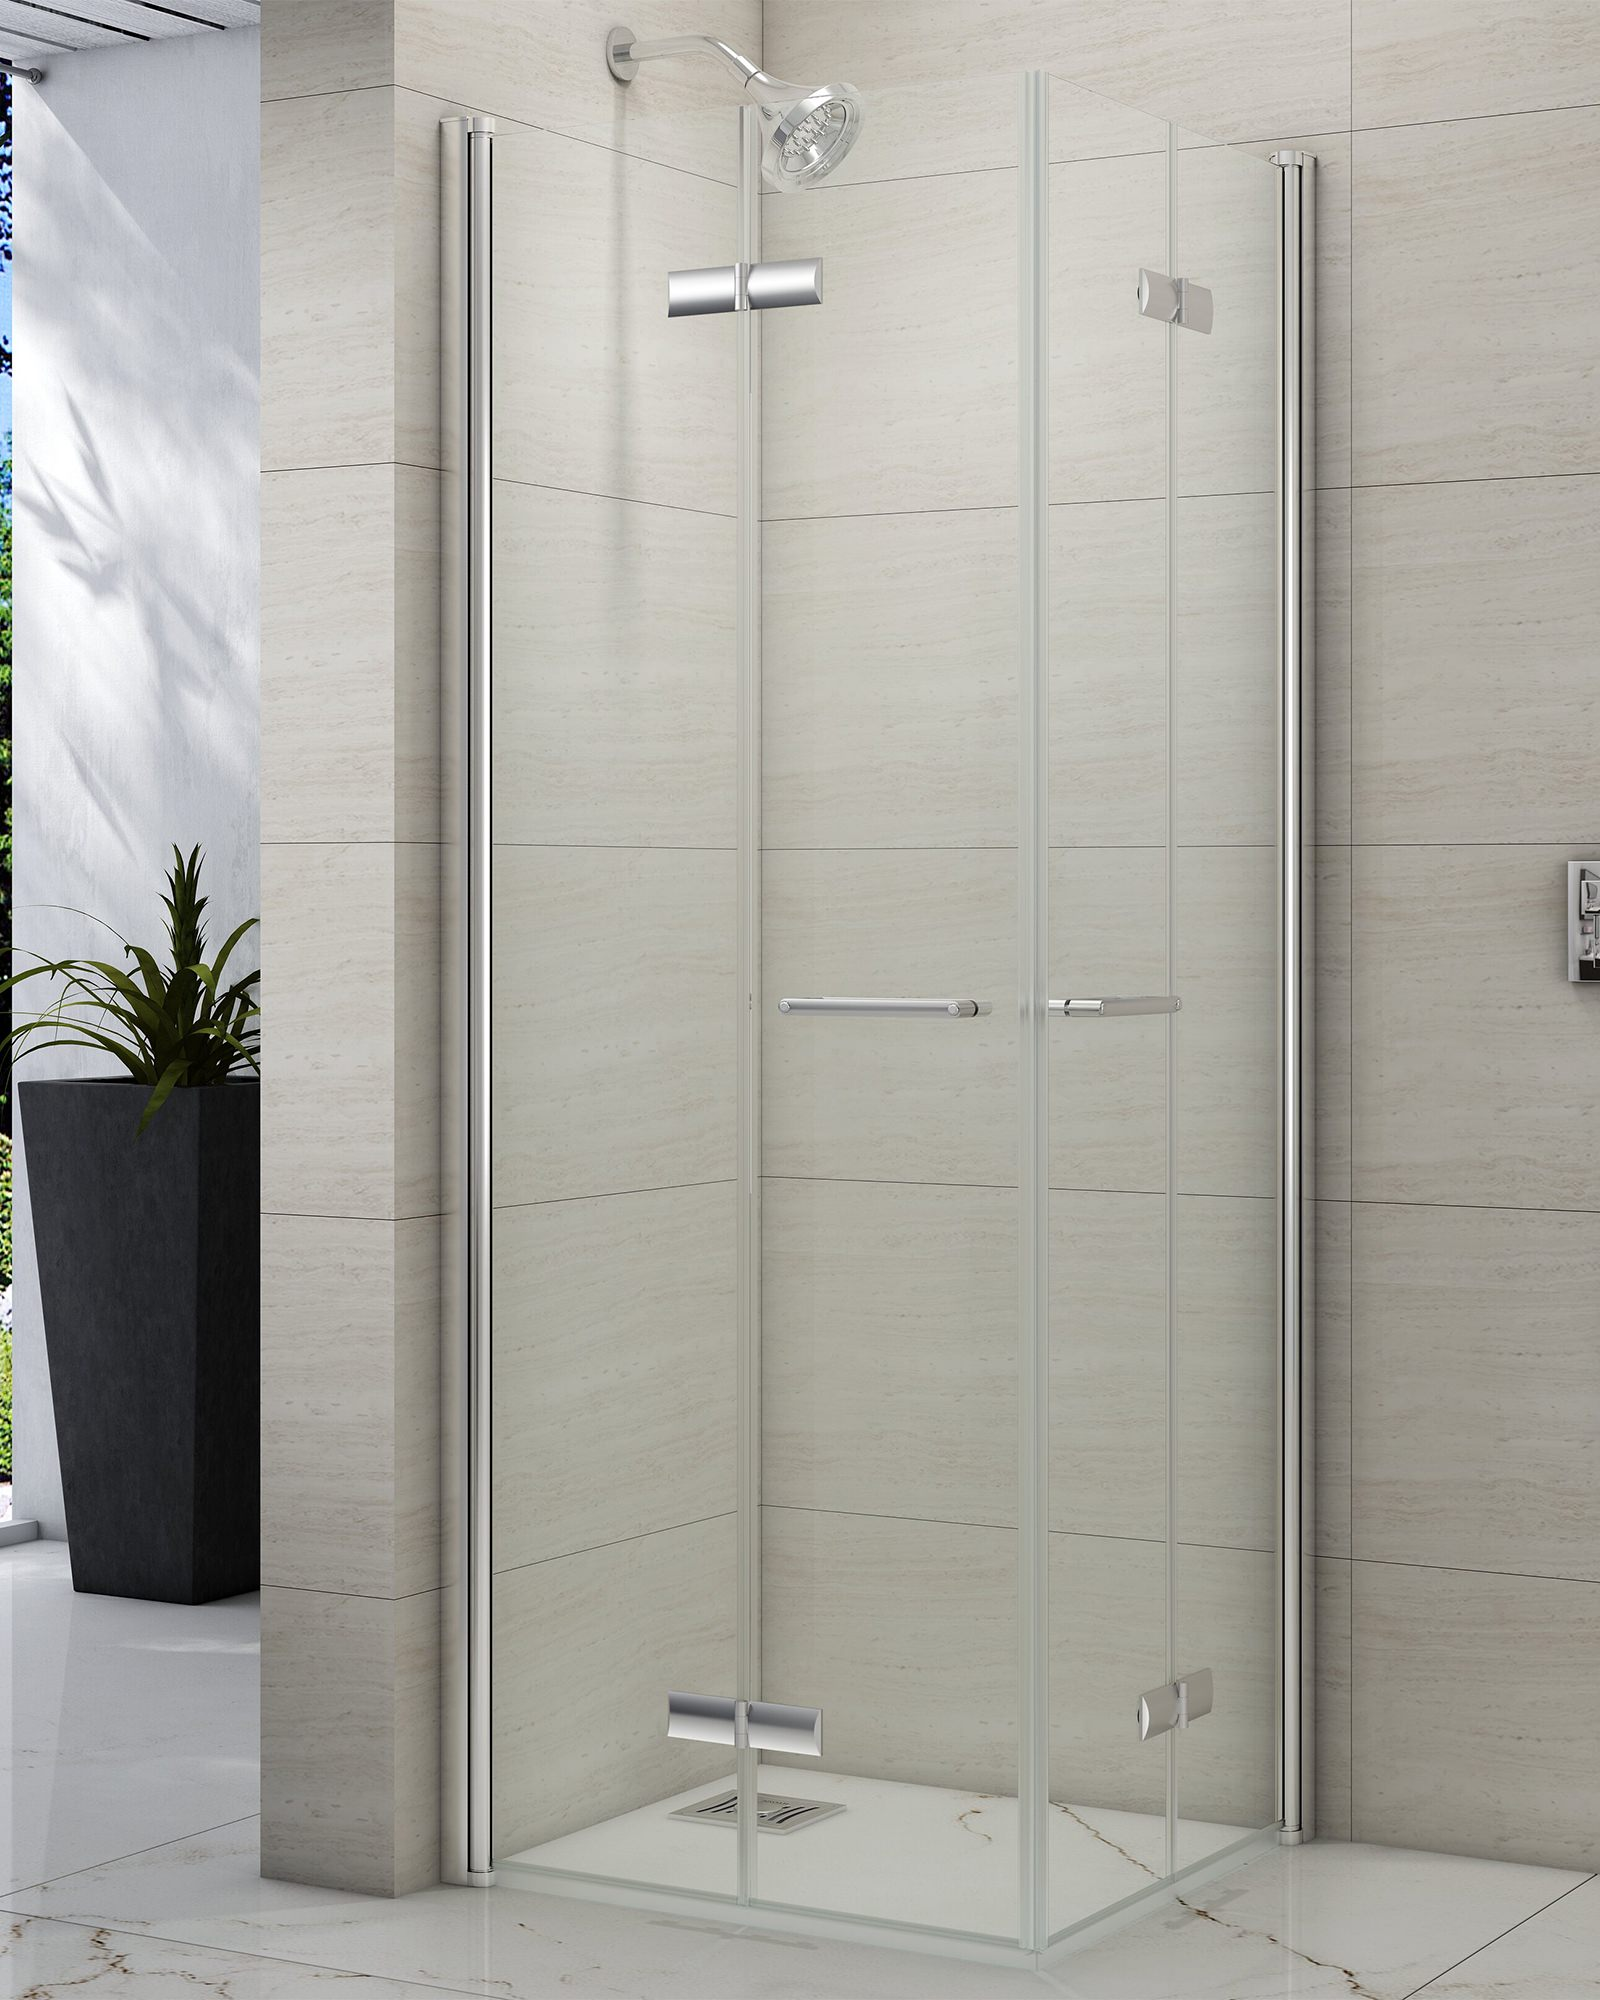 Merlyn 8 series 800mm 2 door quadrant shower enclosure - Merlyn 8 Series Double Folding Showerwall